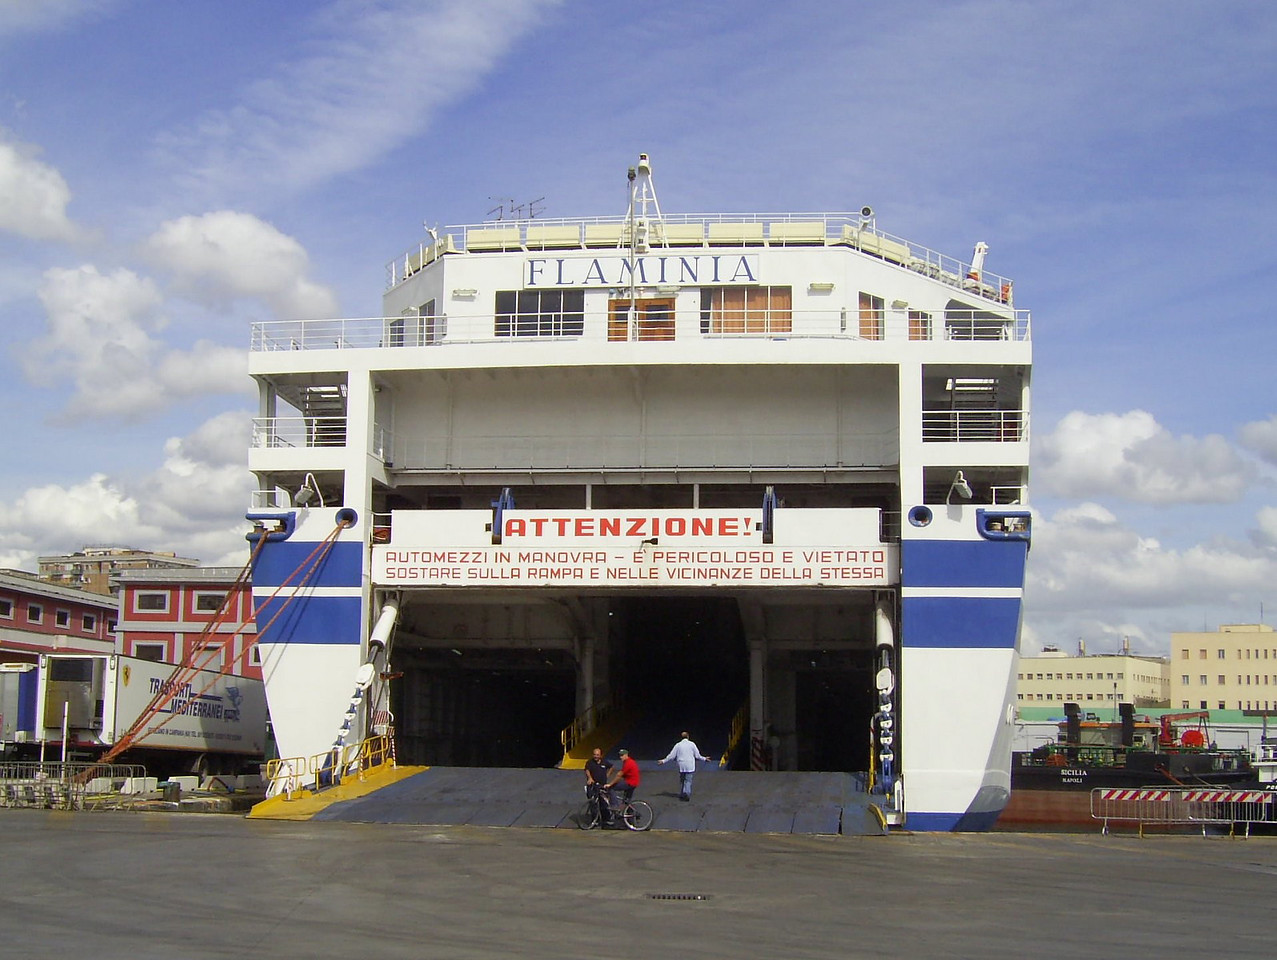 2007 - F/B FLAMINIA moored in Napoli.